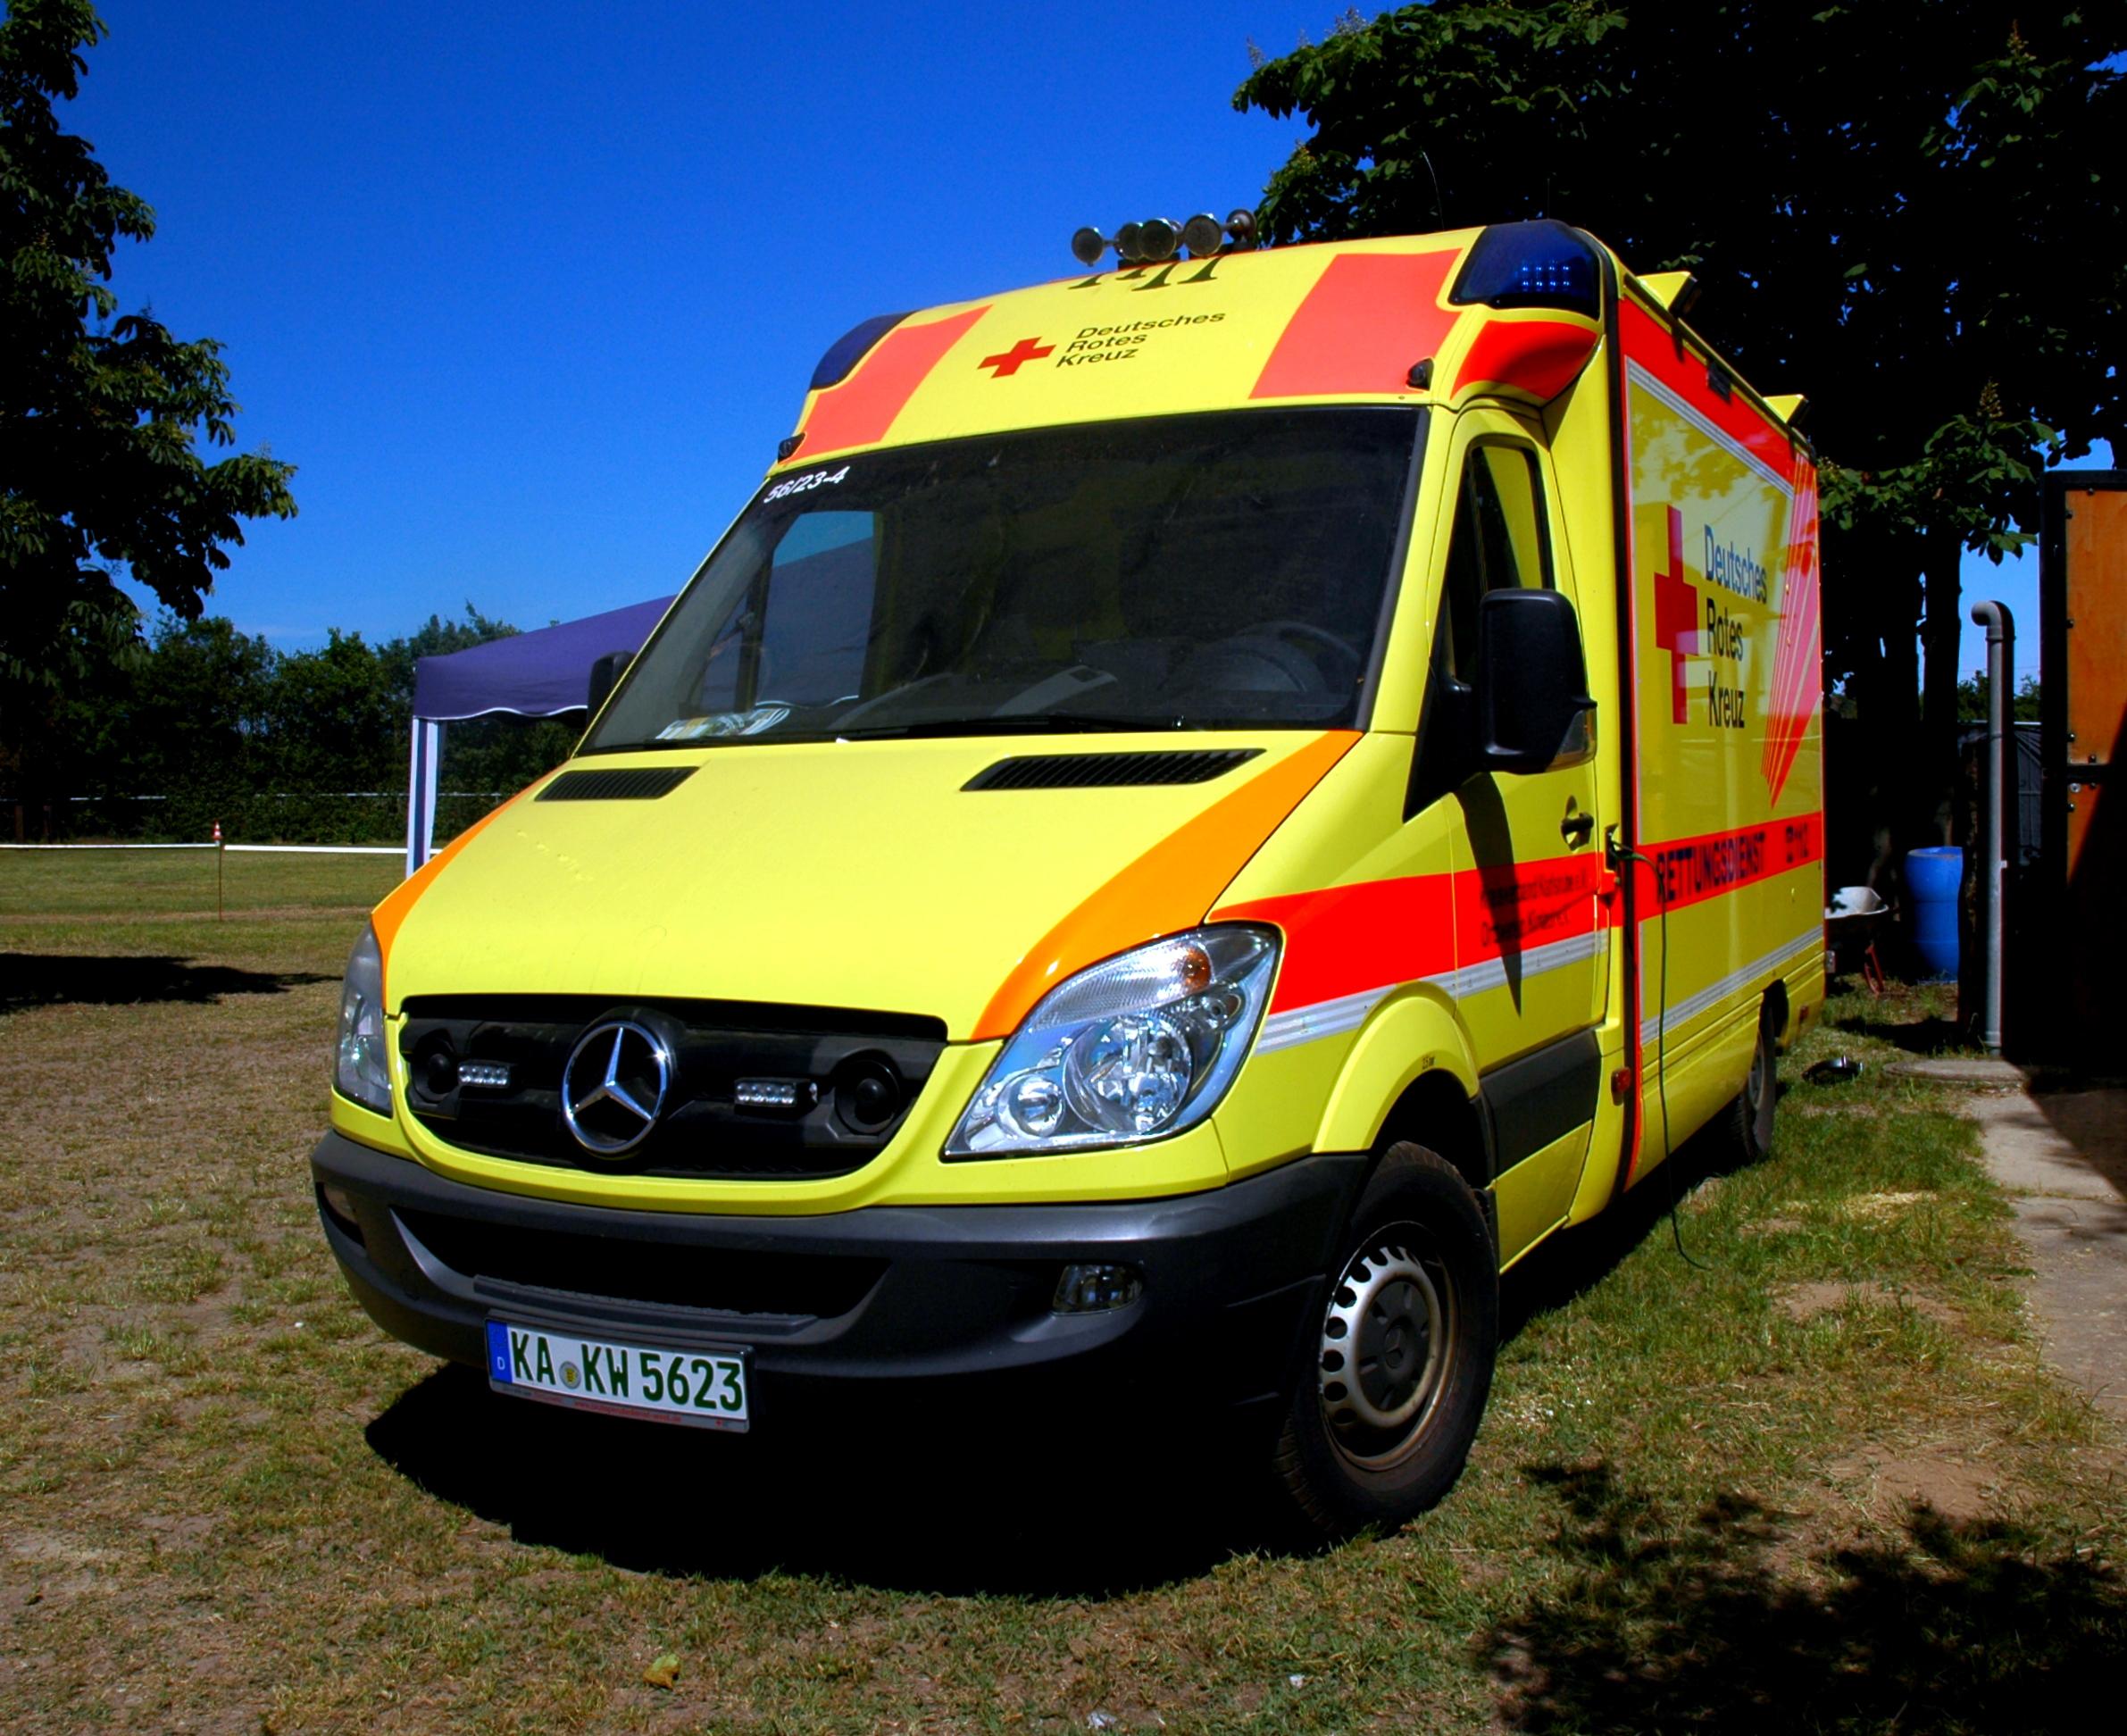 File:Reilingen - Ambulanz - Deutsche Rotes Kreuz - Mercedes